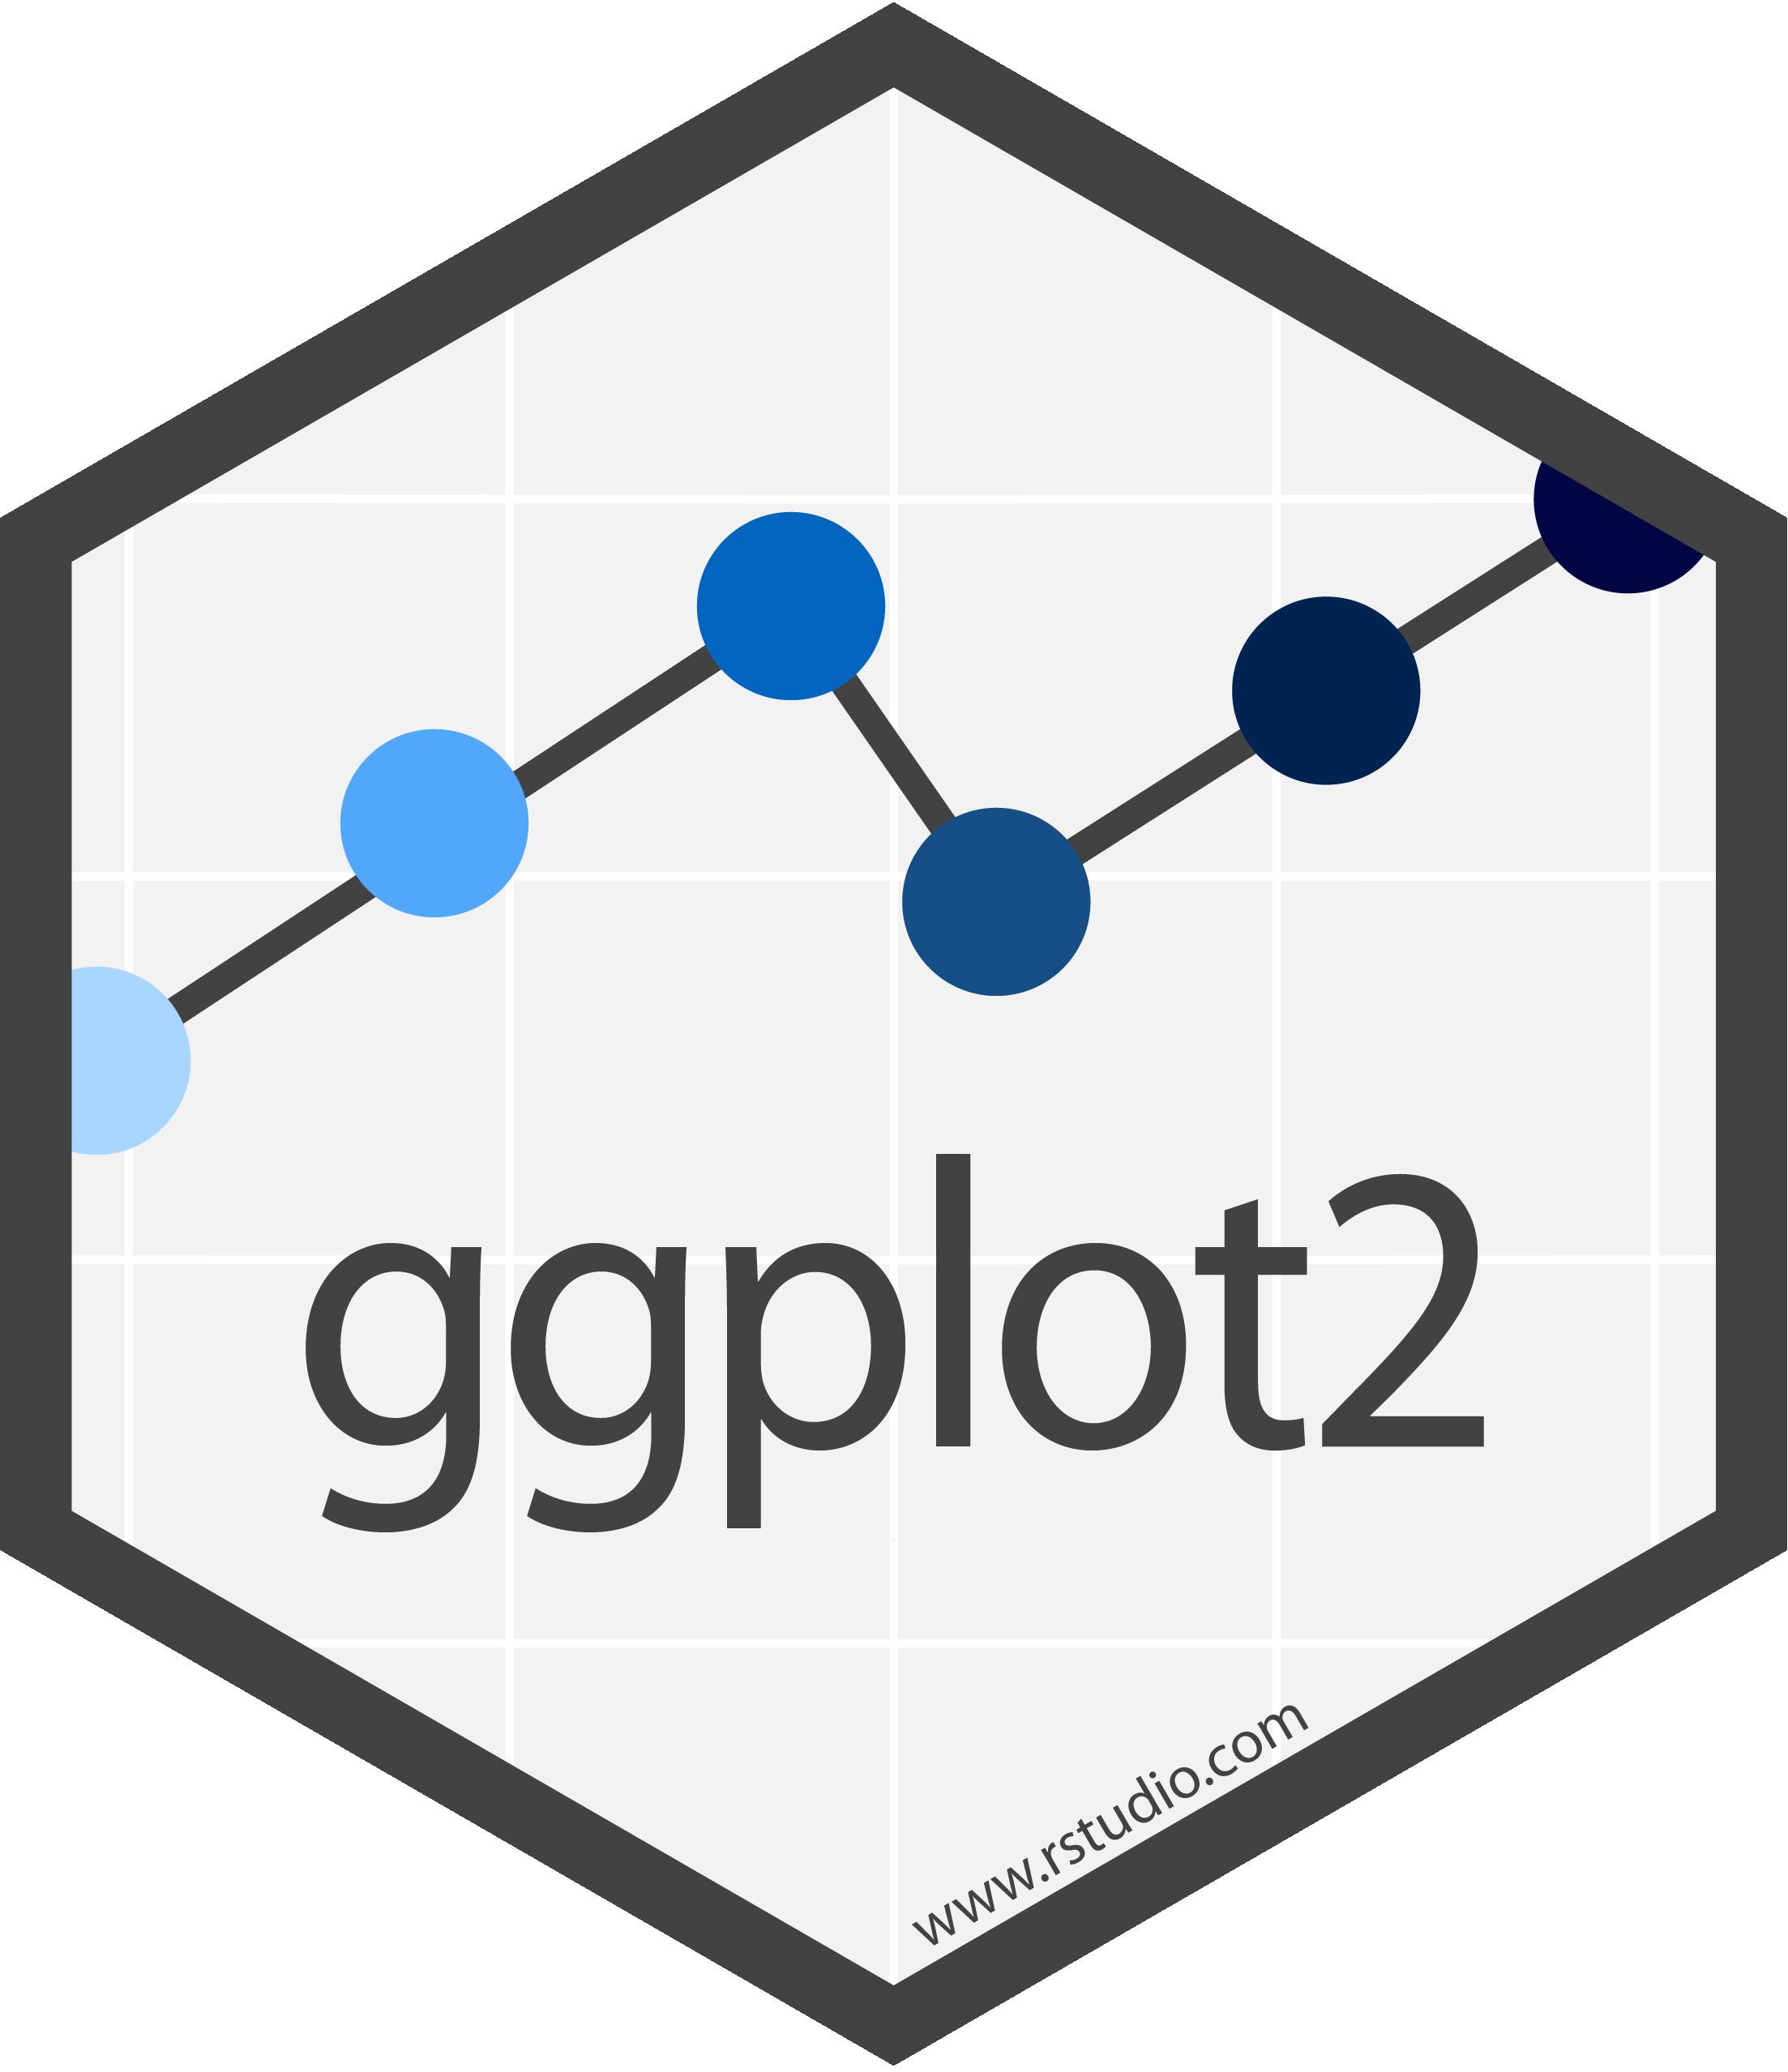 r-cran-ggplot2 avatar